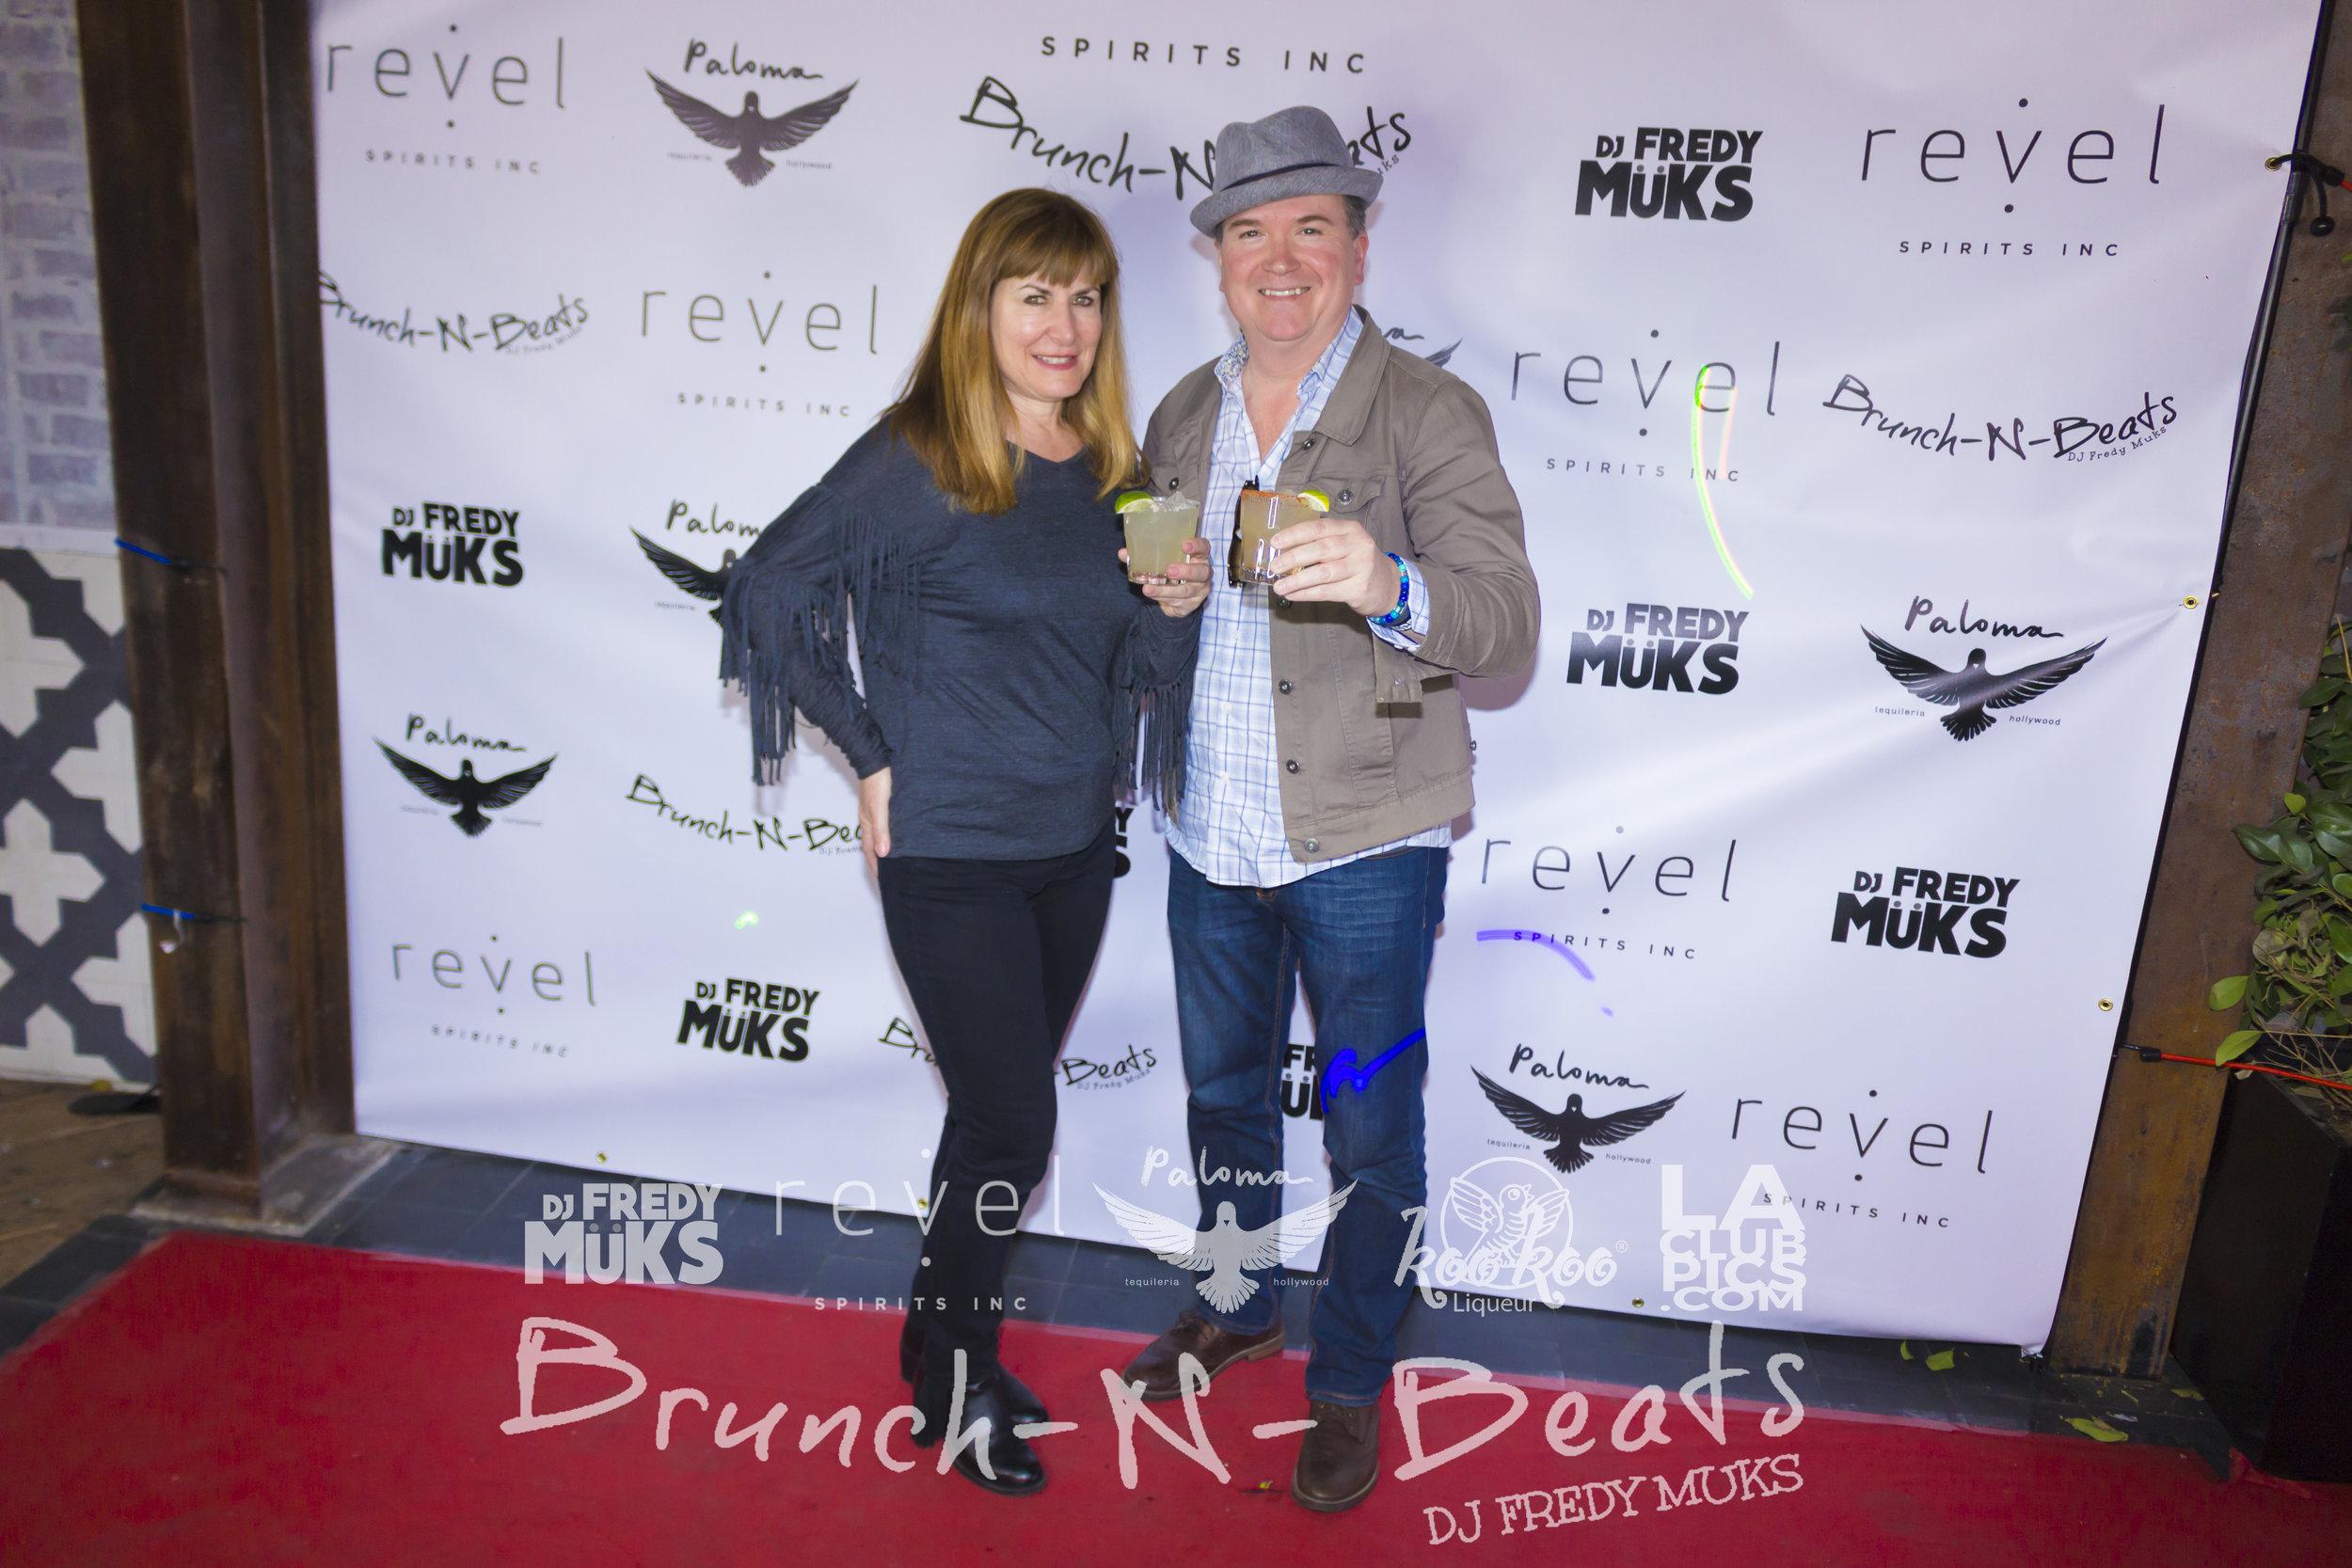 Brunch-N-Beats - Paloma Hollywood - 02-25-18_116.jpg